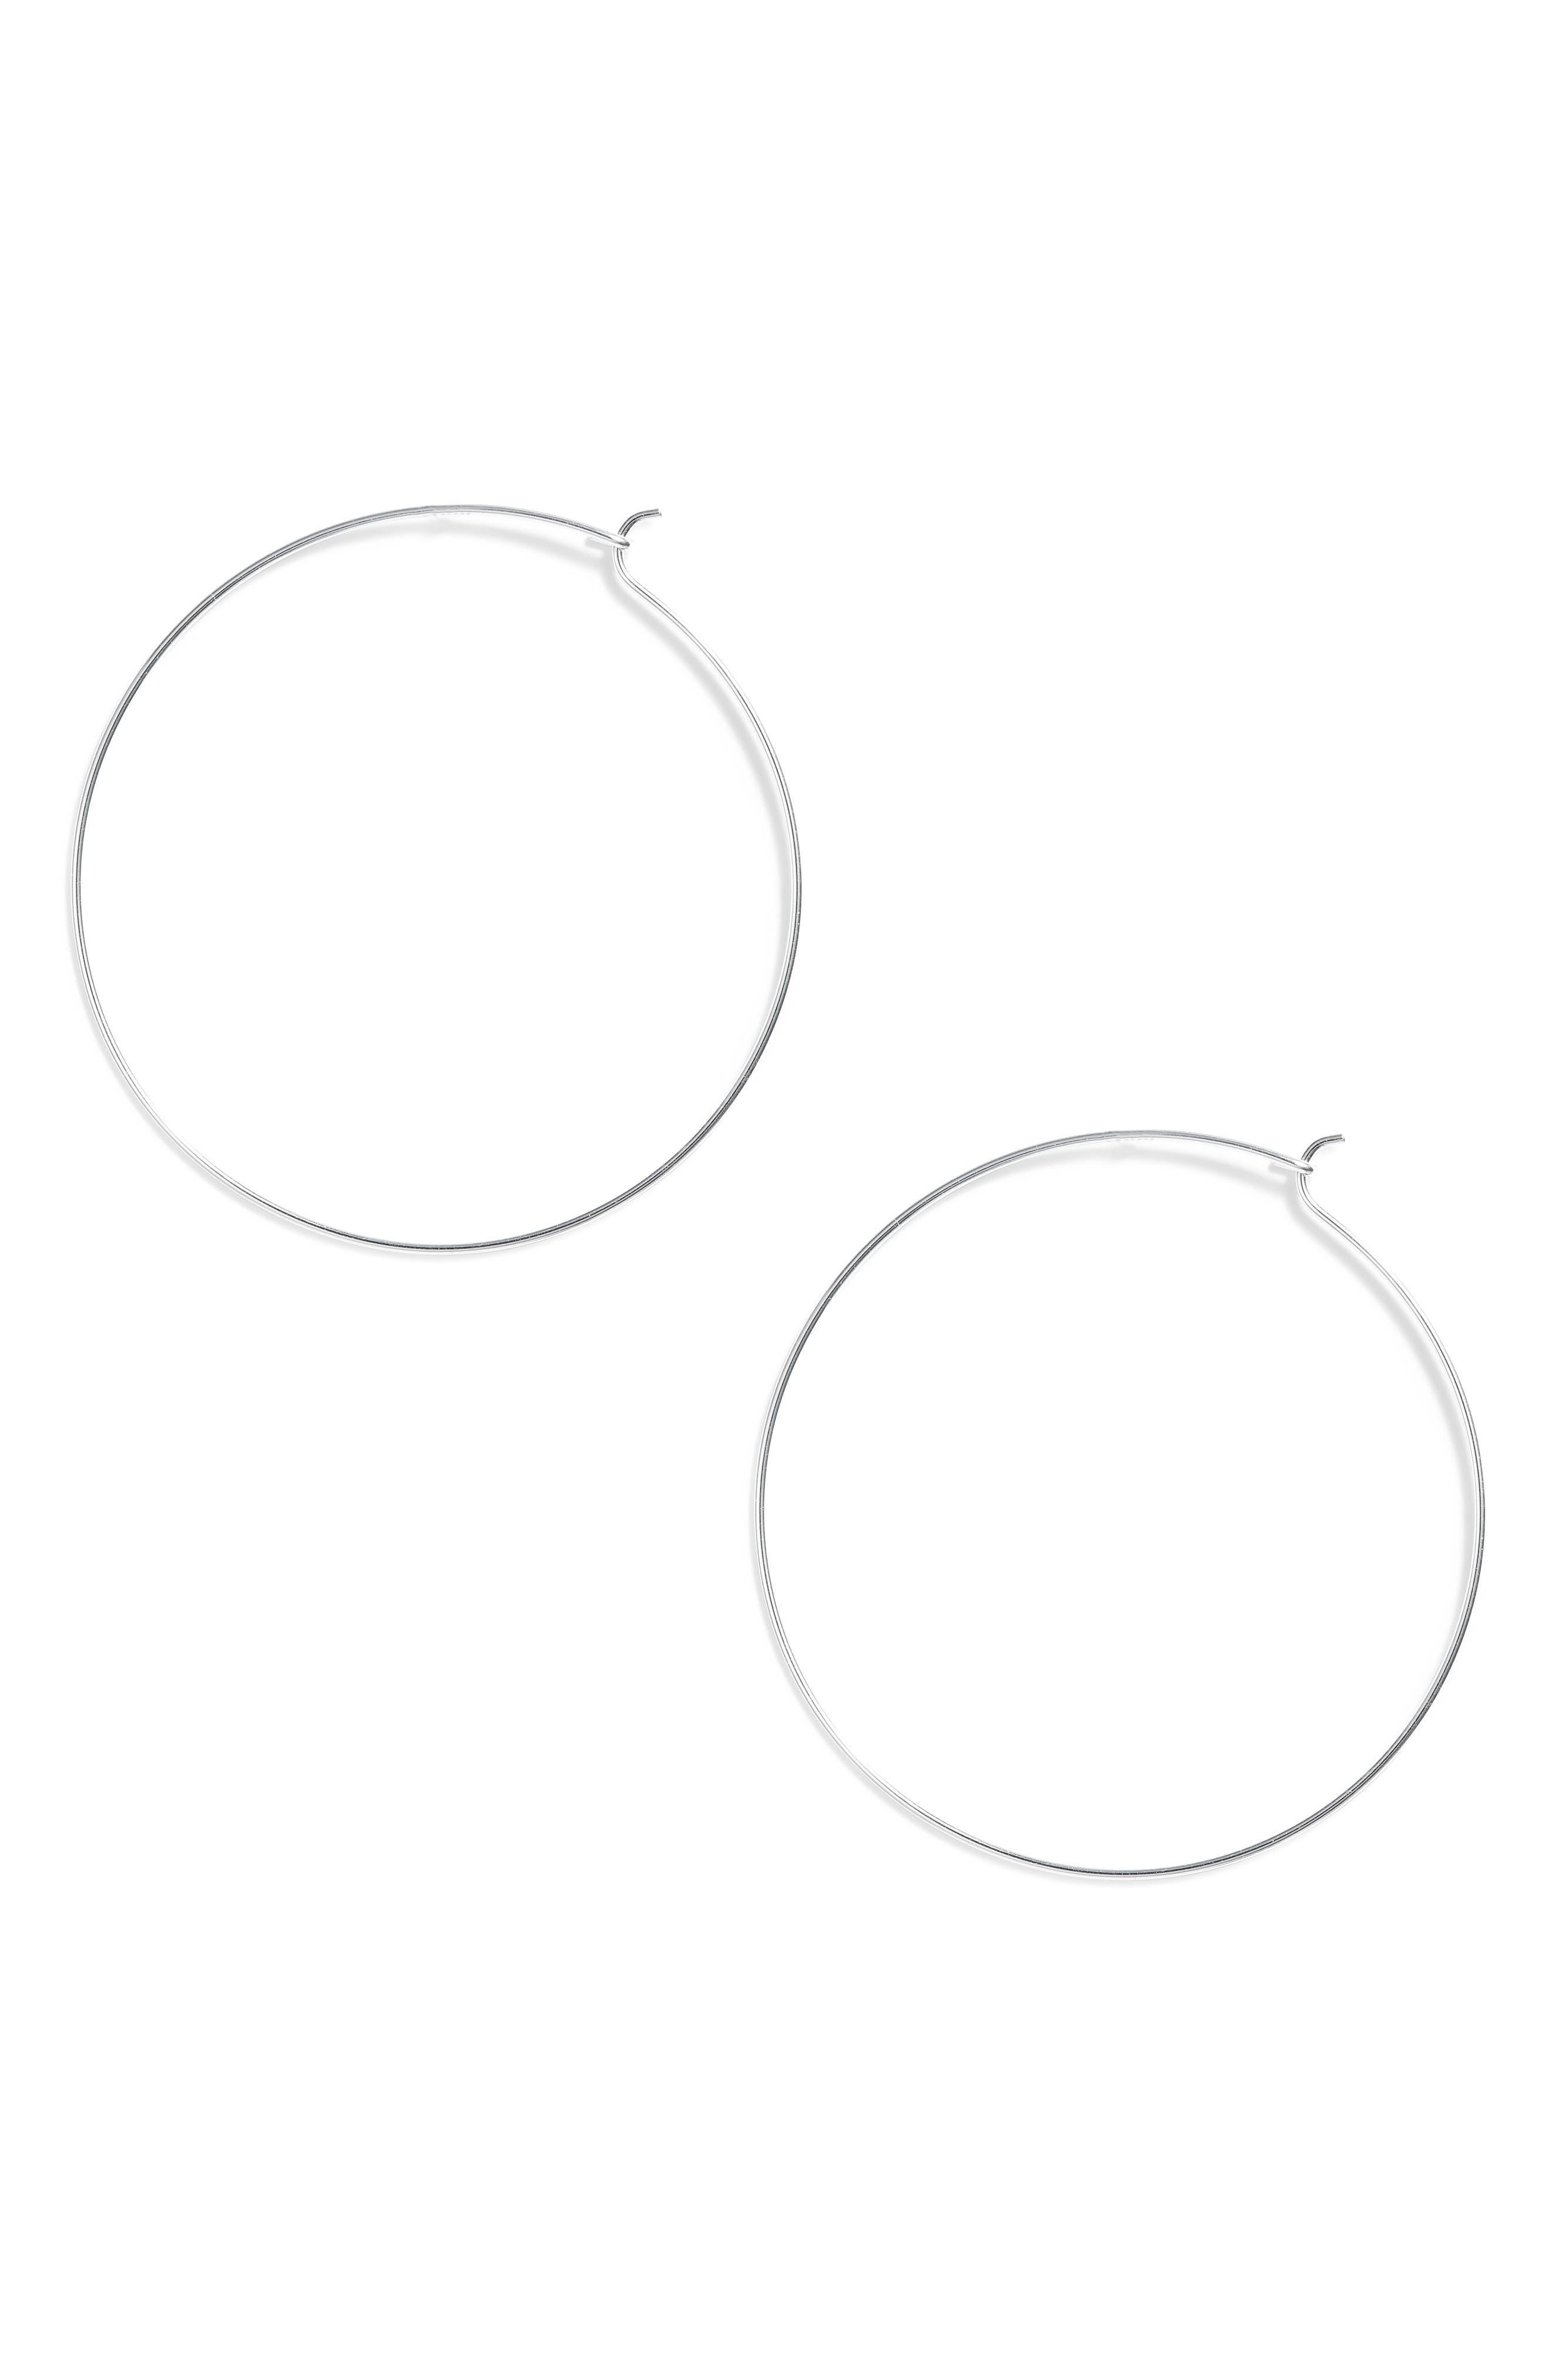 Thin Hoop Earrings,                         Main,                         color, SILVER